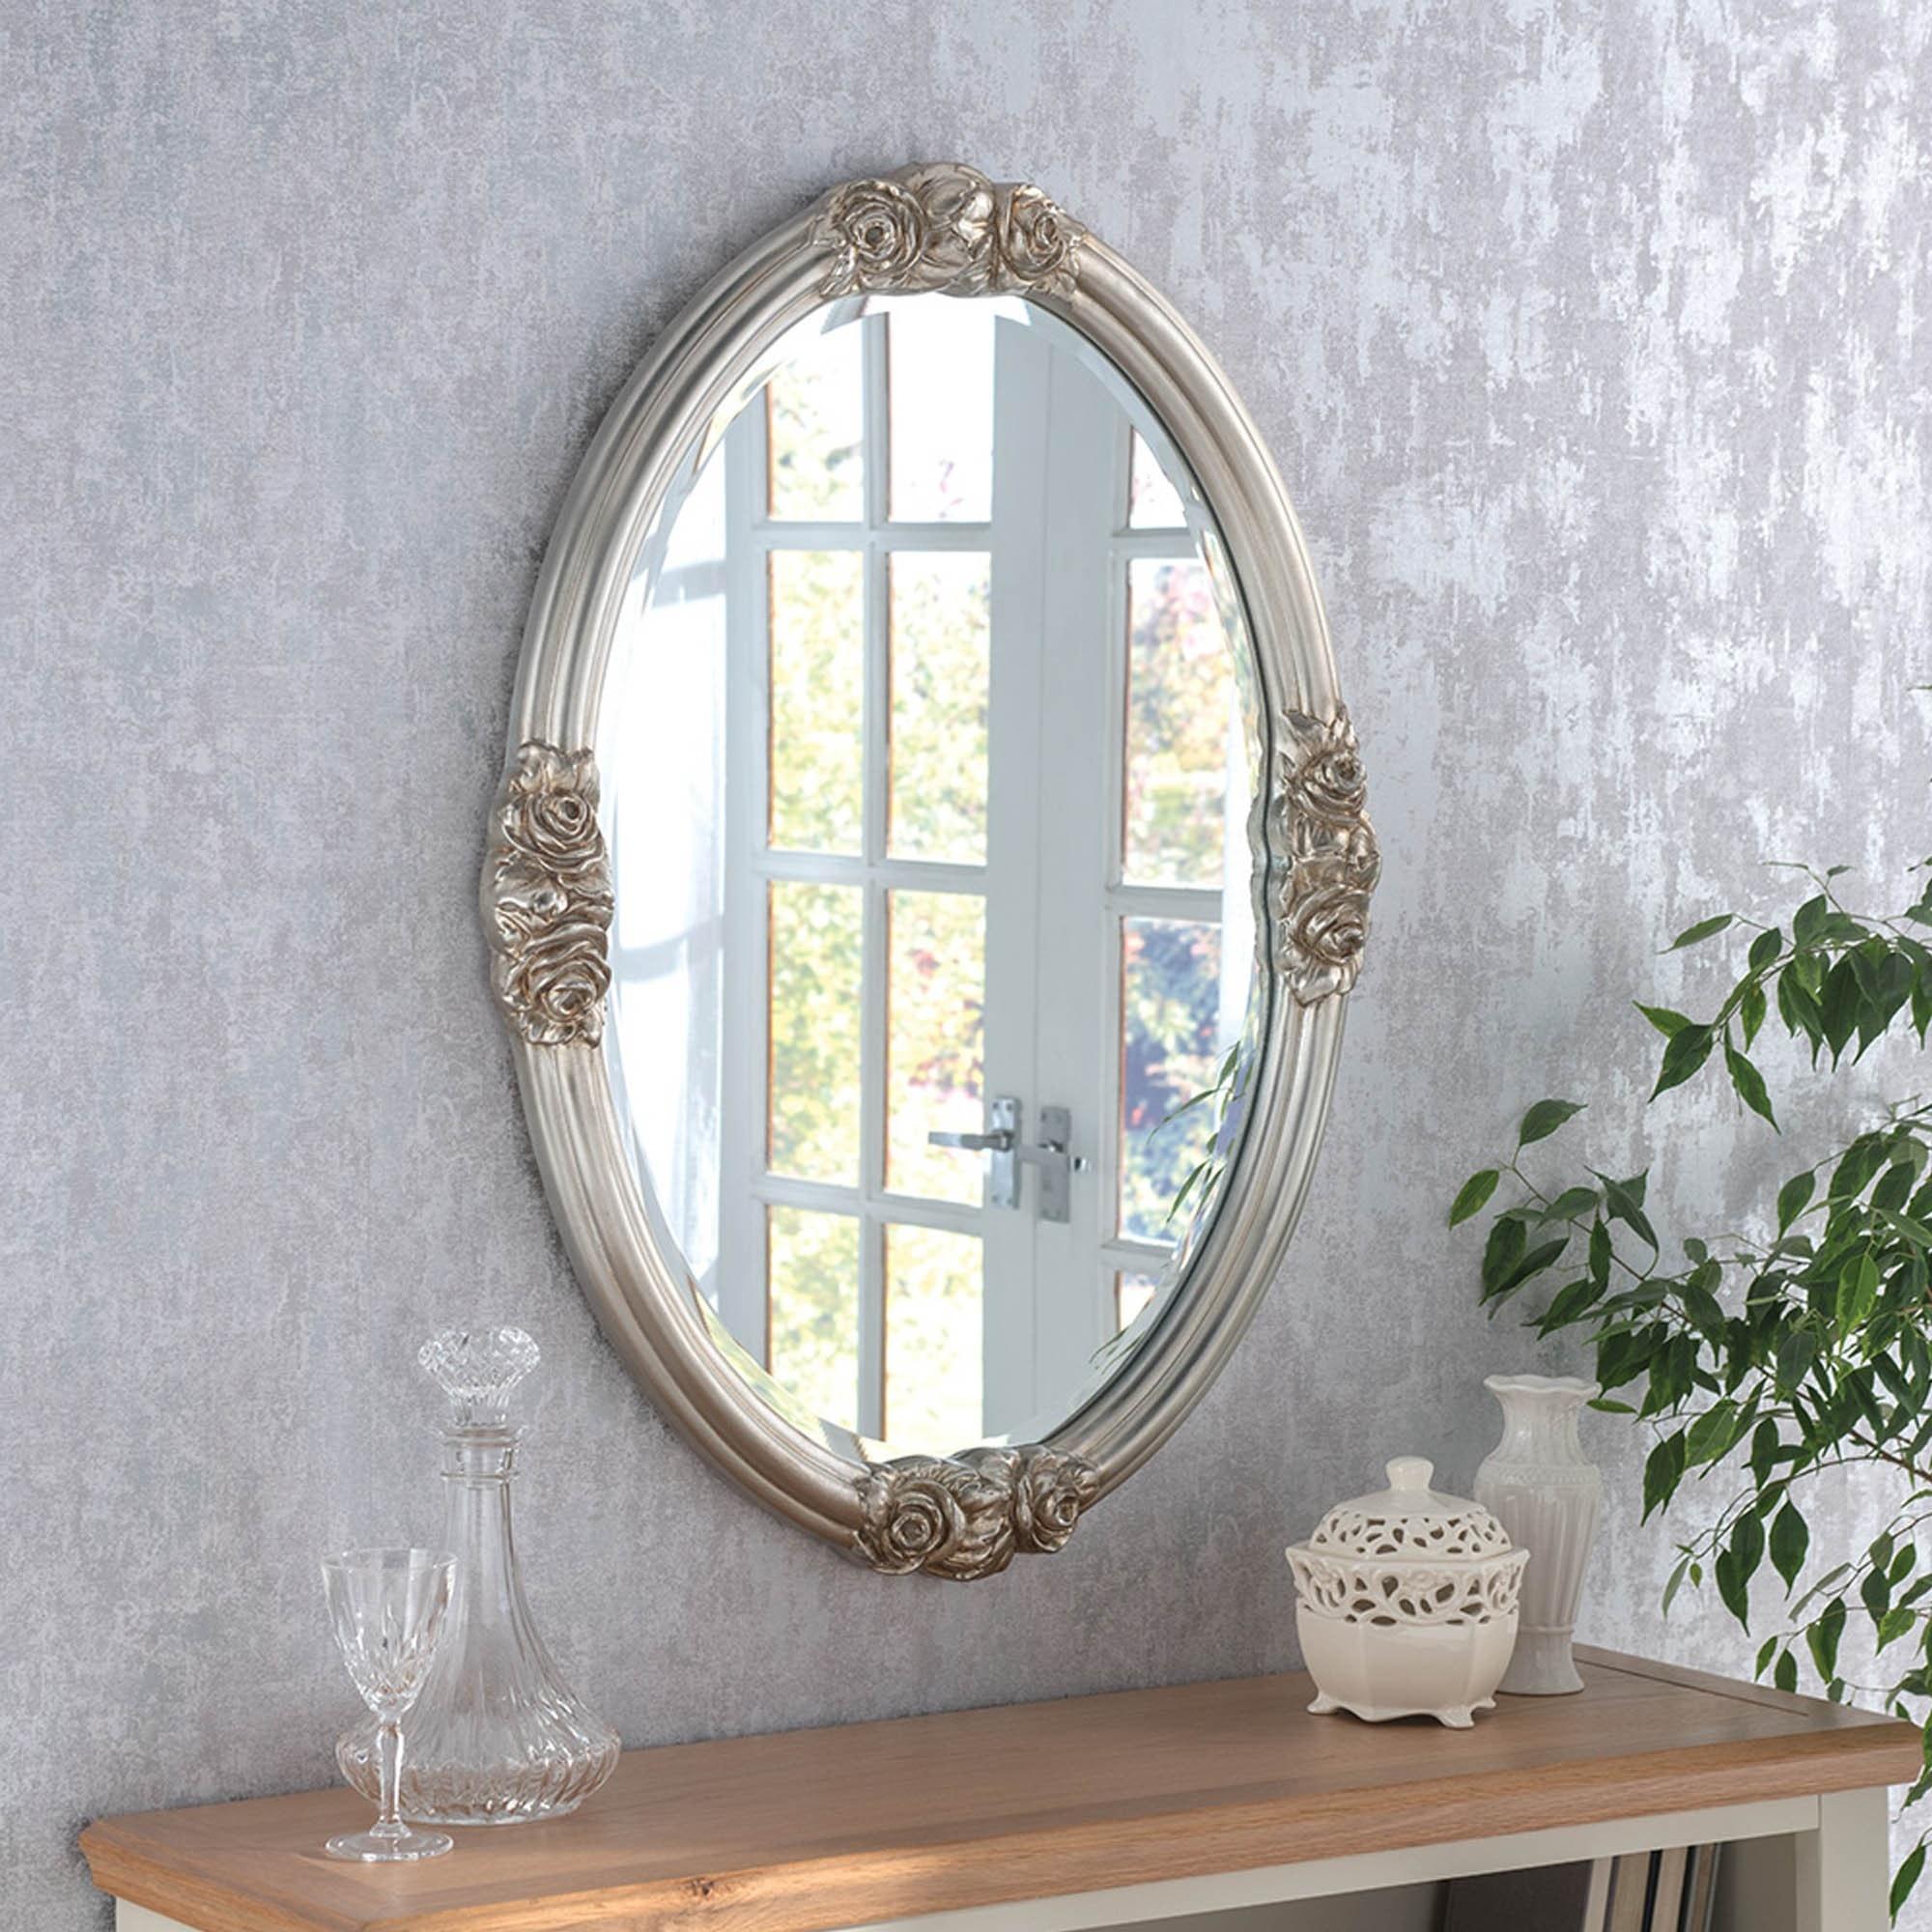 Silver Wall Mirrors Decorative.Decorative Oval Silver Ornate Wall Mirror